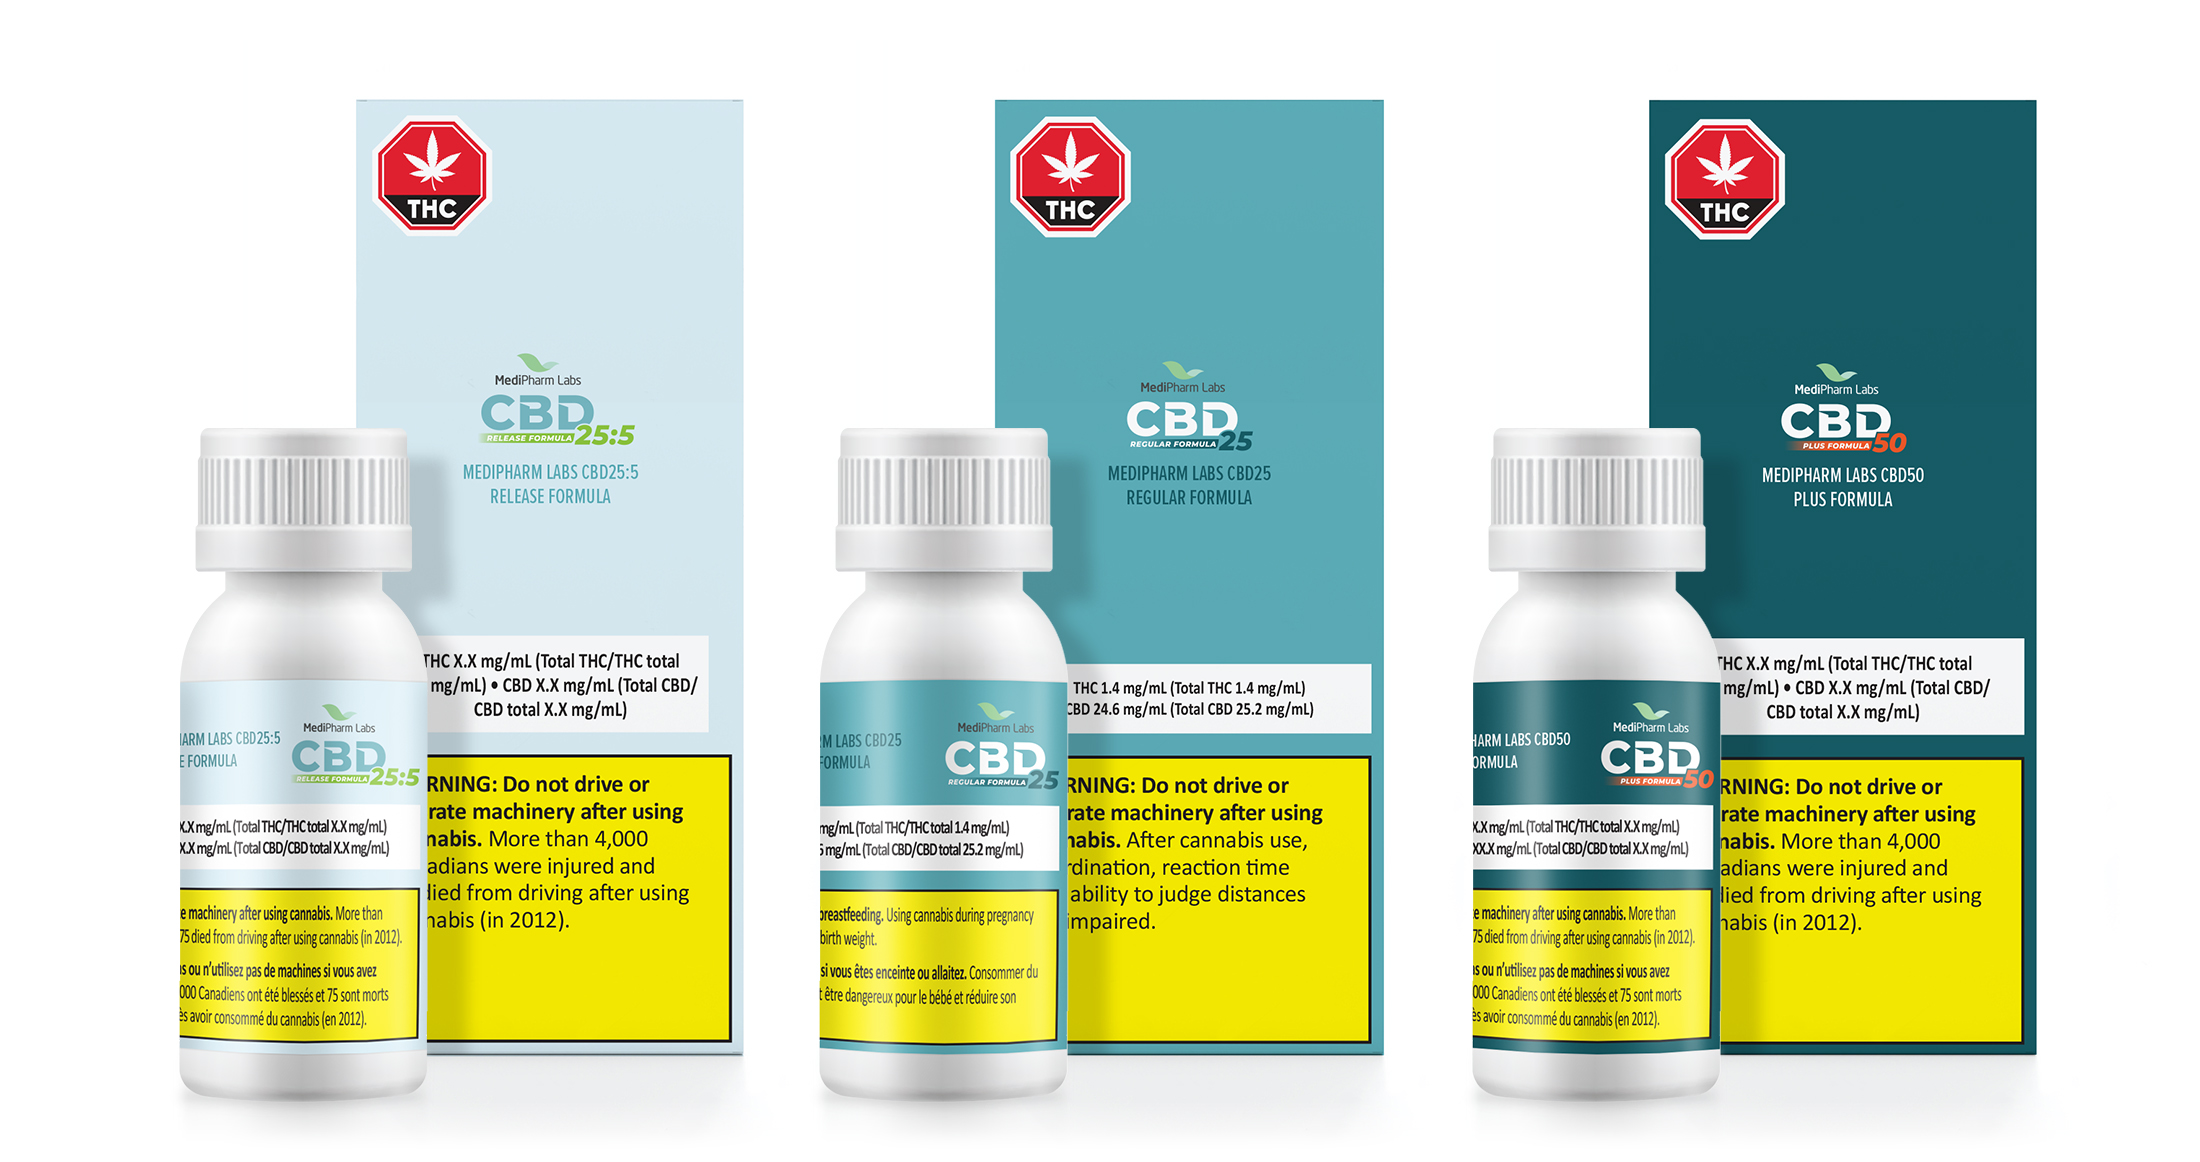 MediPharm Labs CBD REGULAR FORMULA 25